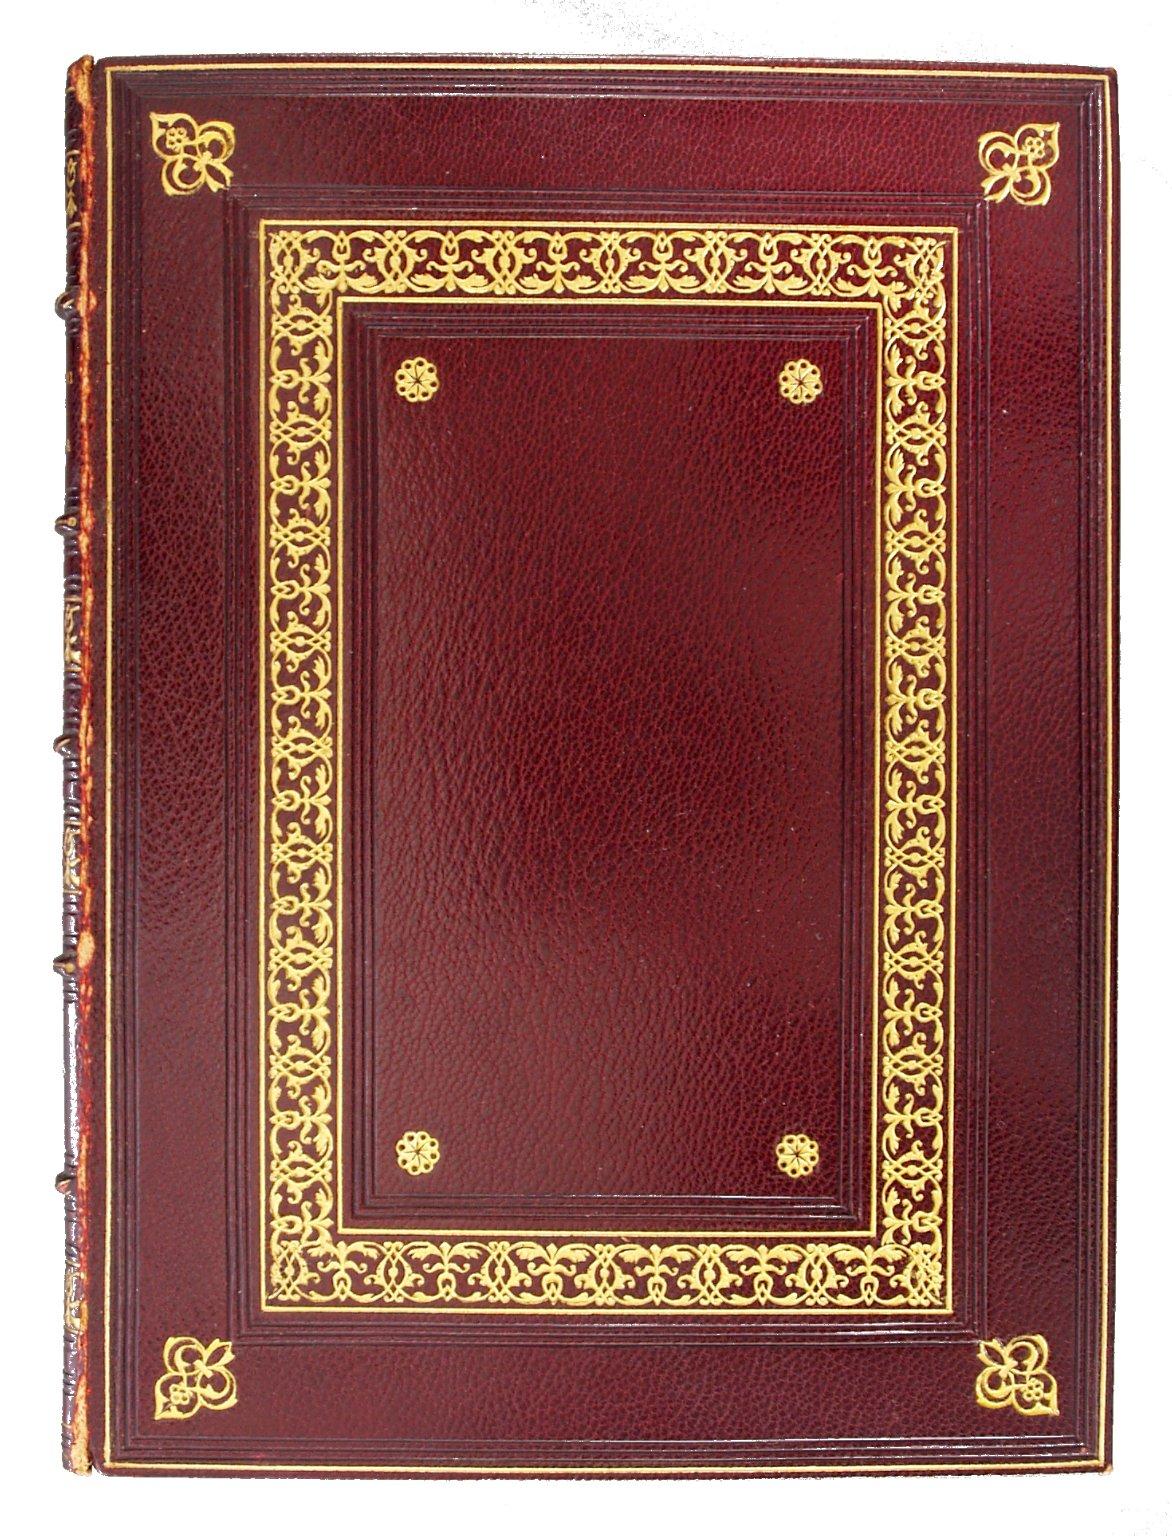 Cover, INC P745 copy 1.